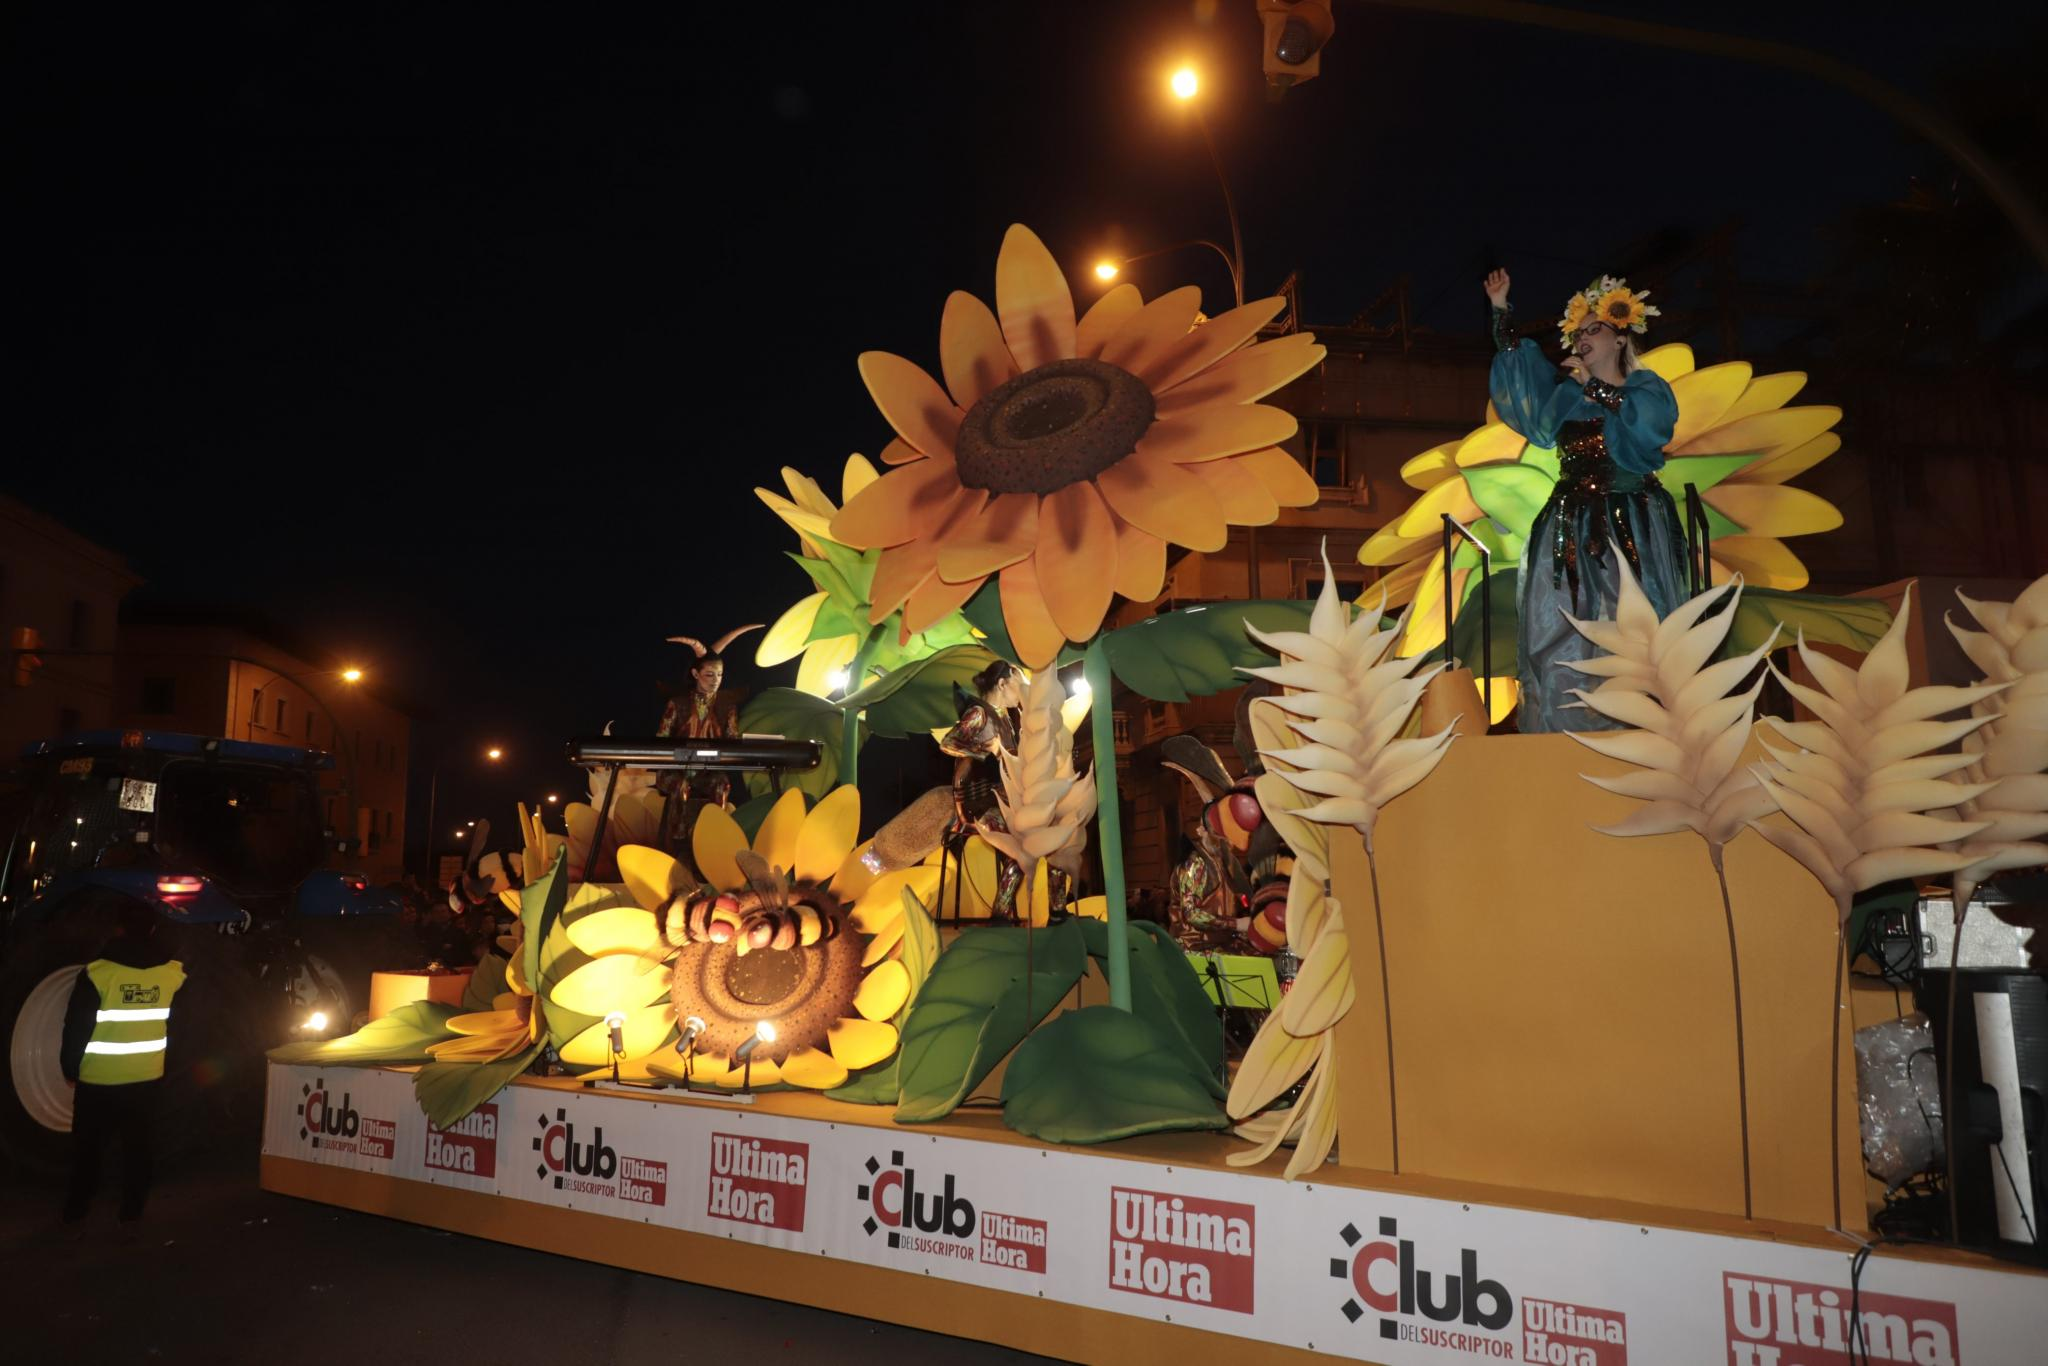 Three Kings Parade in Palma